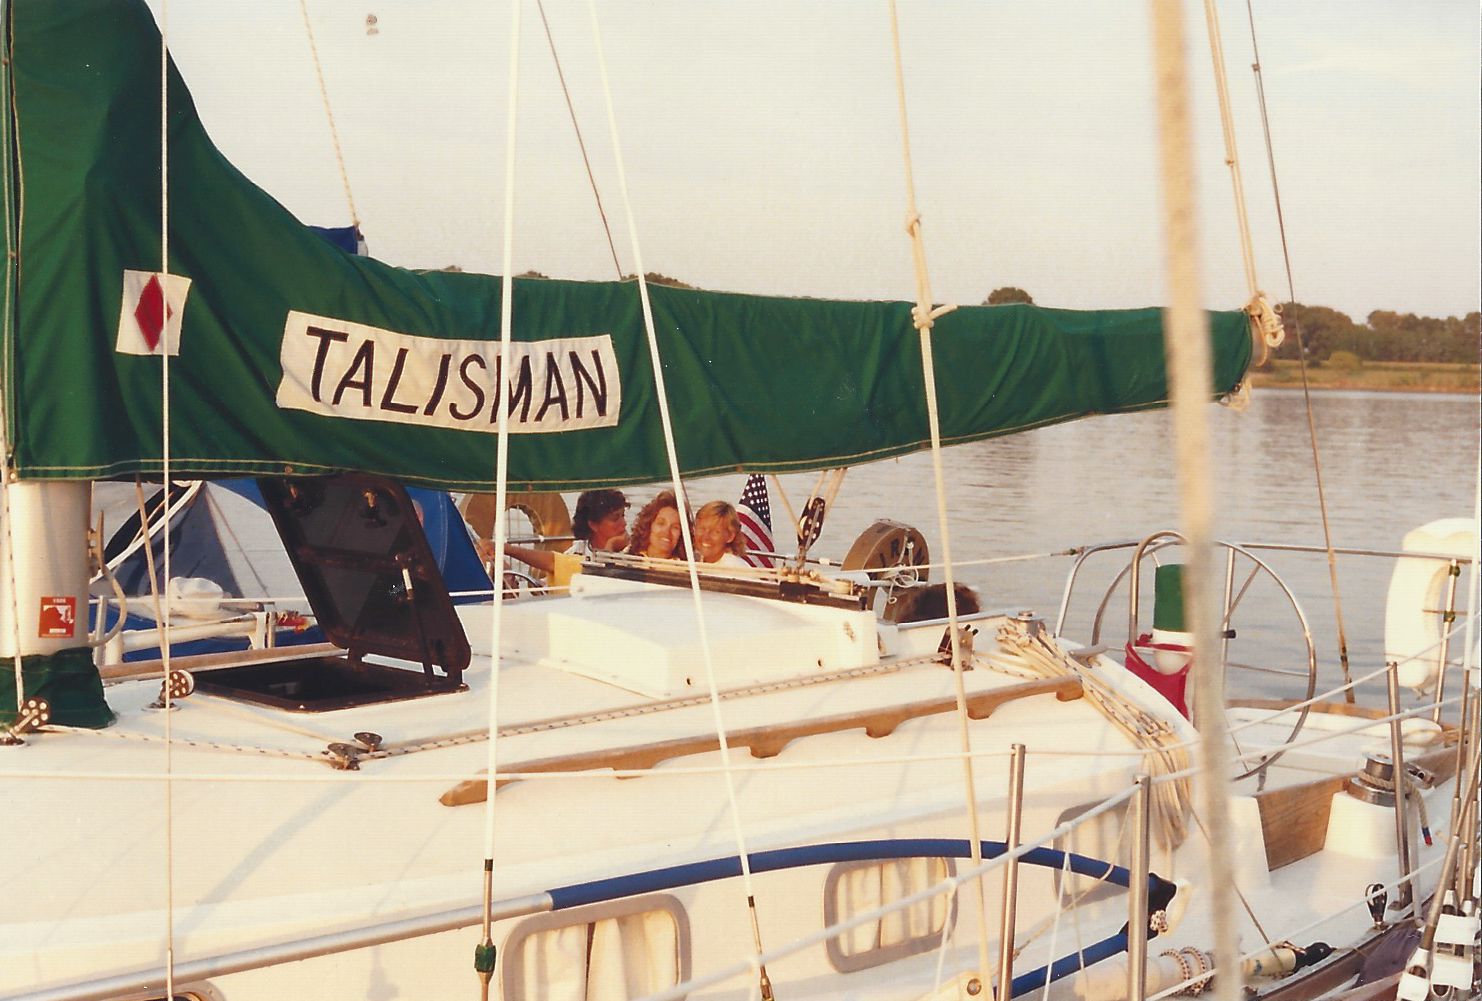 Bristol 29.9, Talismasn Bill and Beryl Flynn